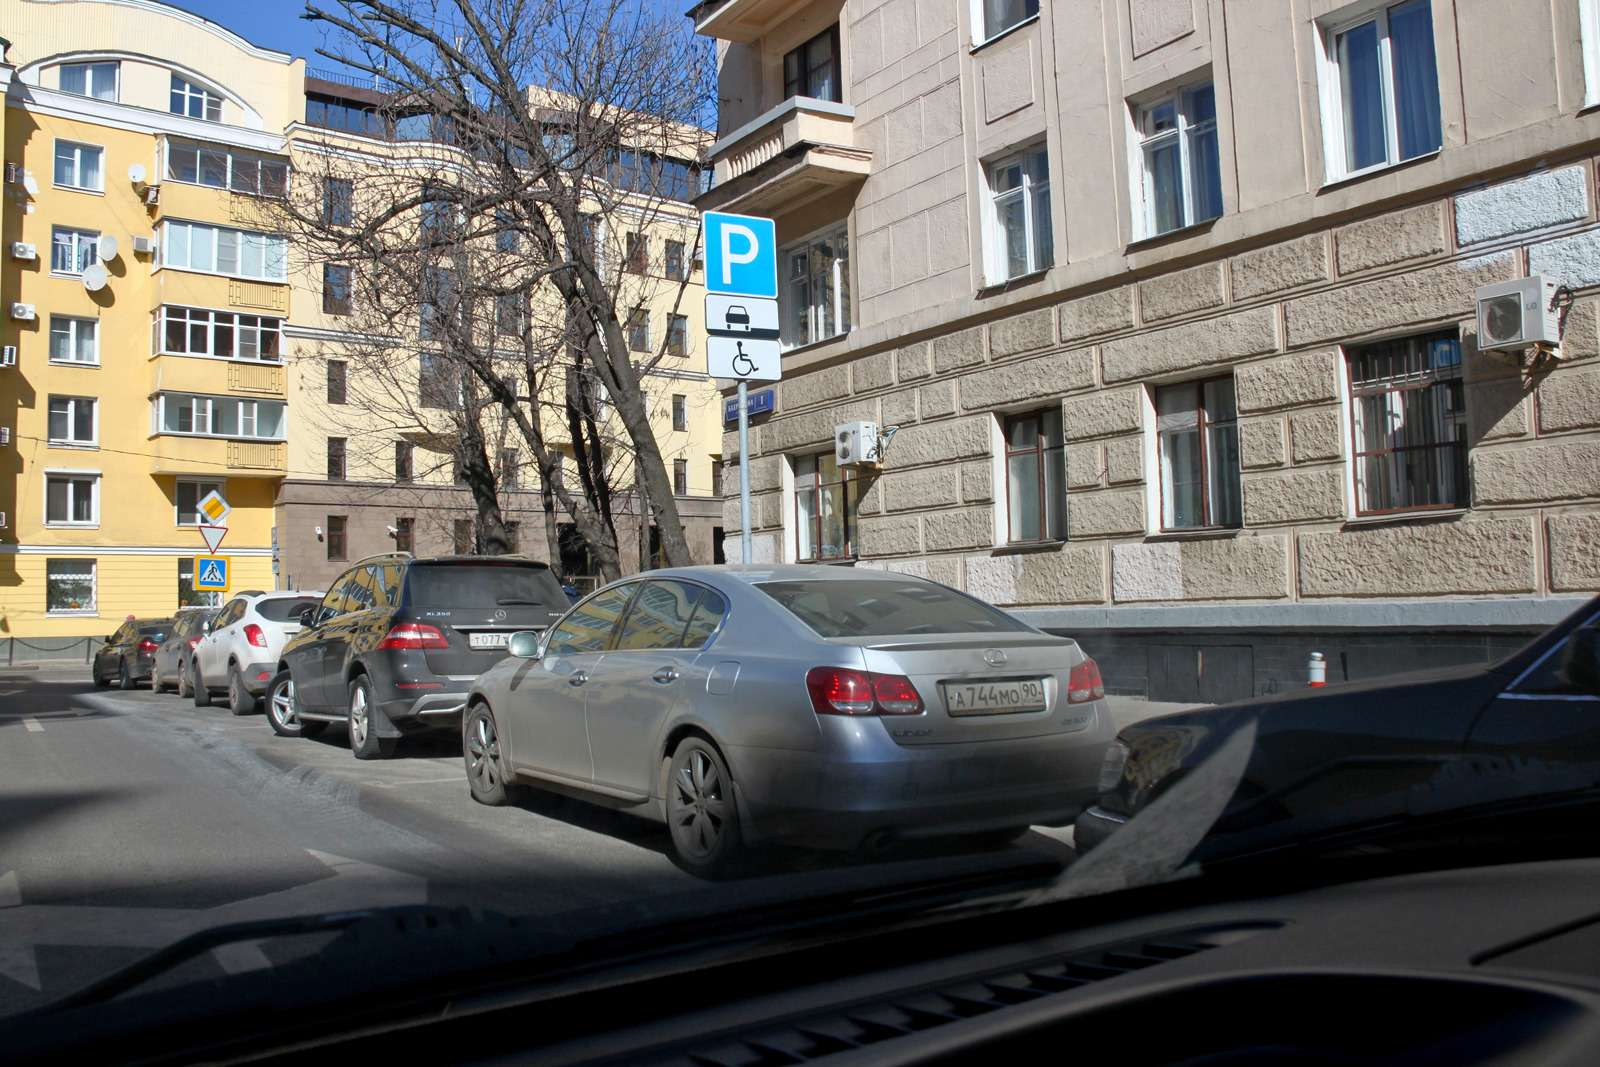 Парковка— дляинвалидов или длялжеинвалидов? Рейд ЗР— фото 585770